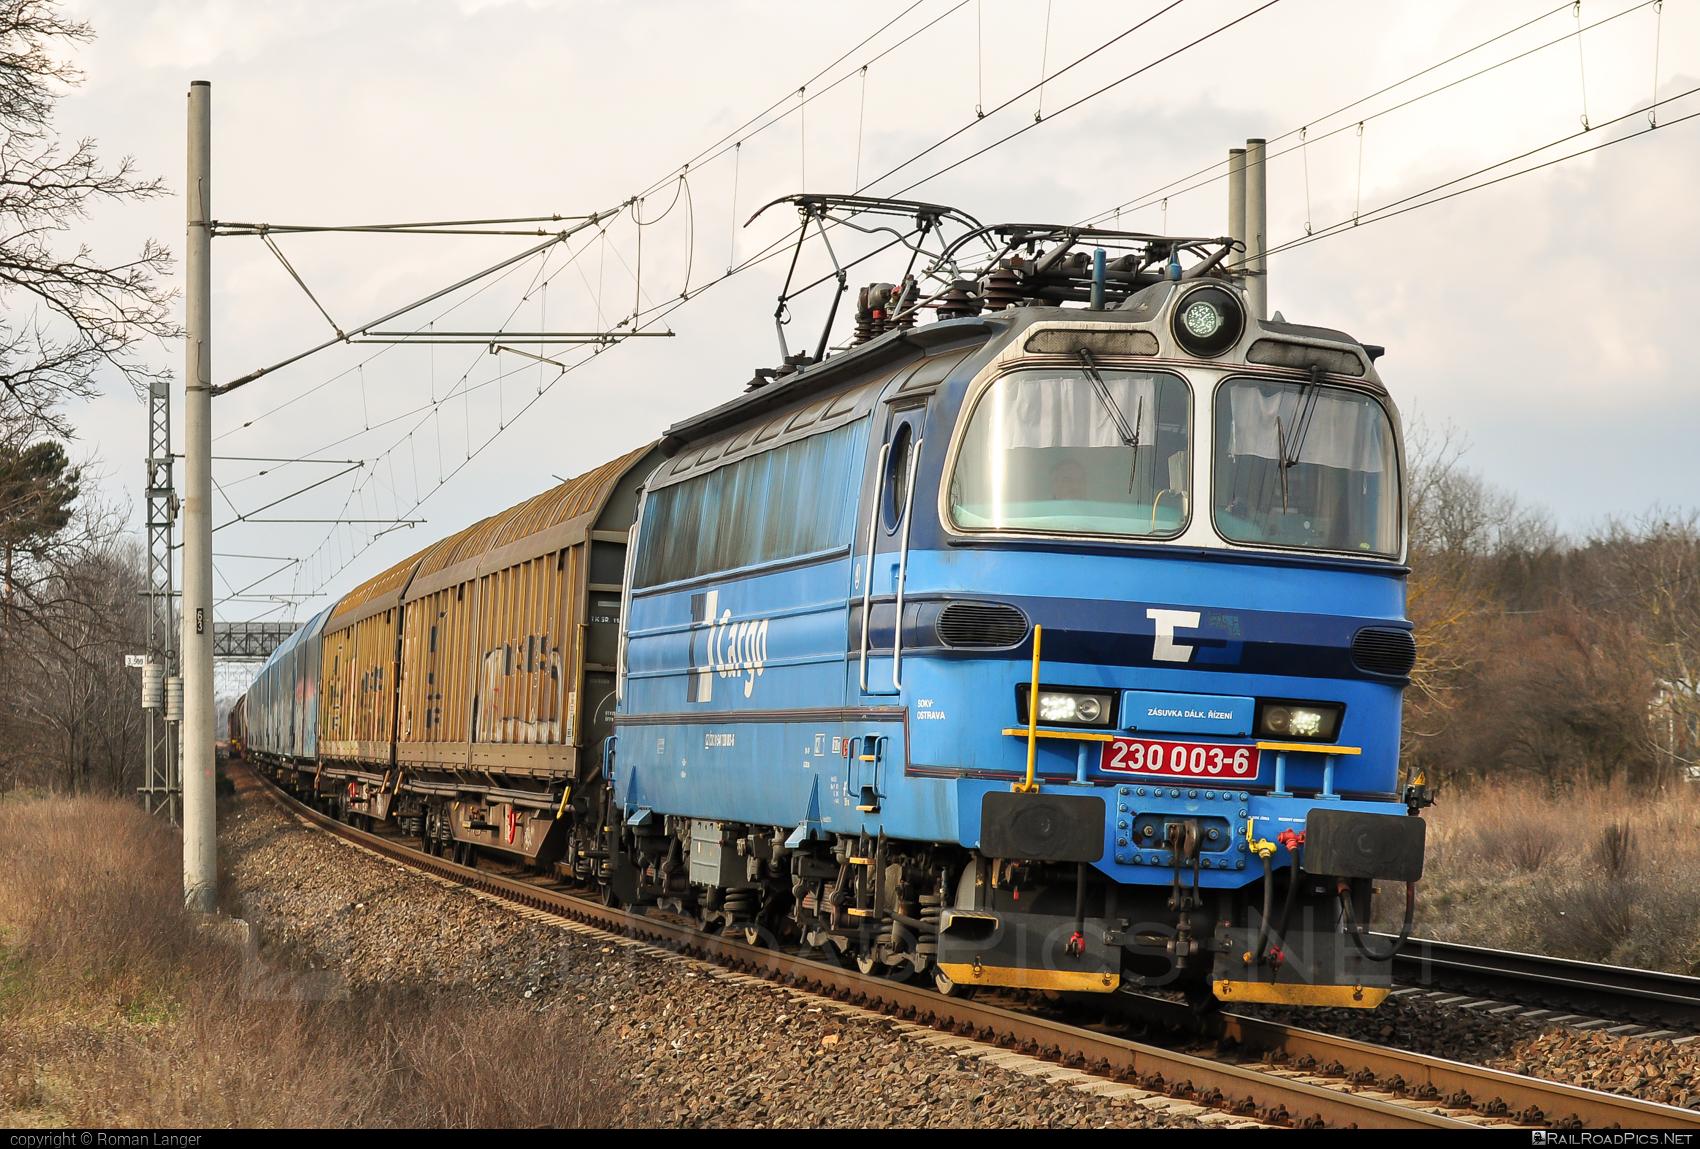 Škoda 47E - 230 003-6 operated by ČD Cargo, a.s. #cdcargo #laminatka #locomotive240 #skoda #skoda47e